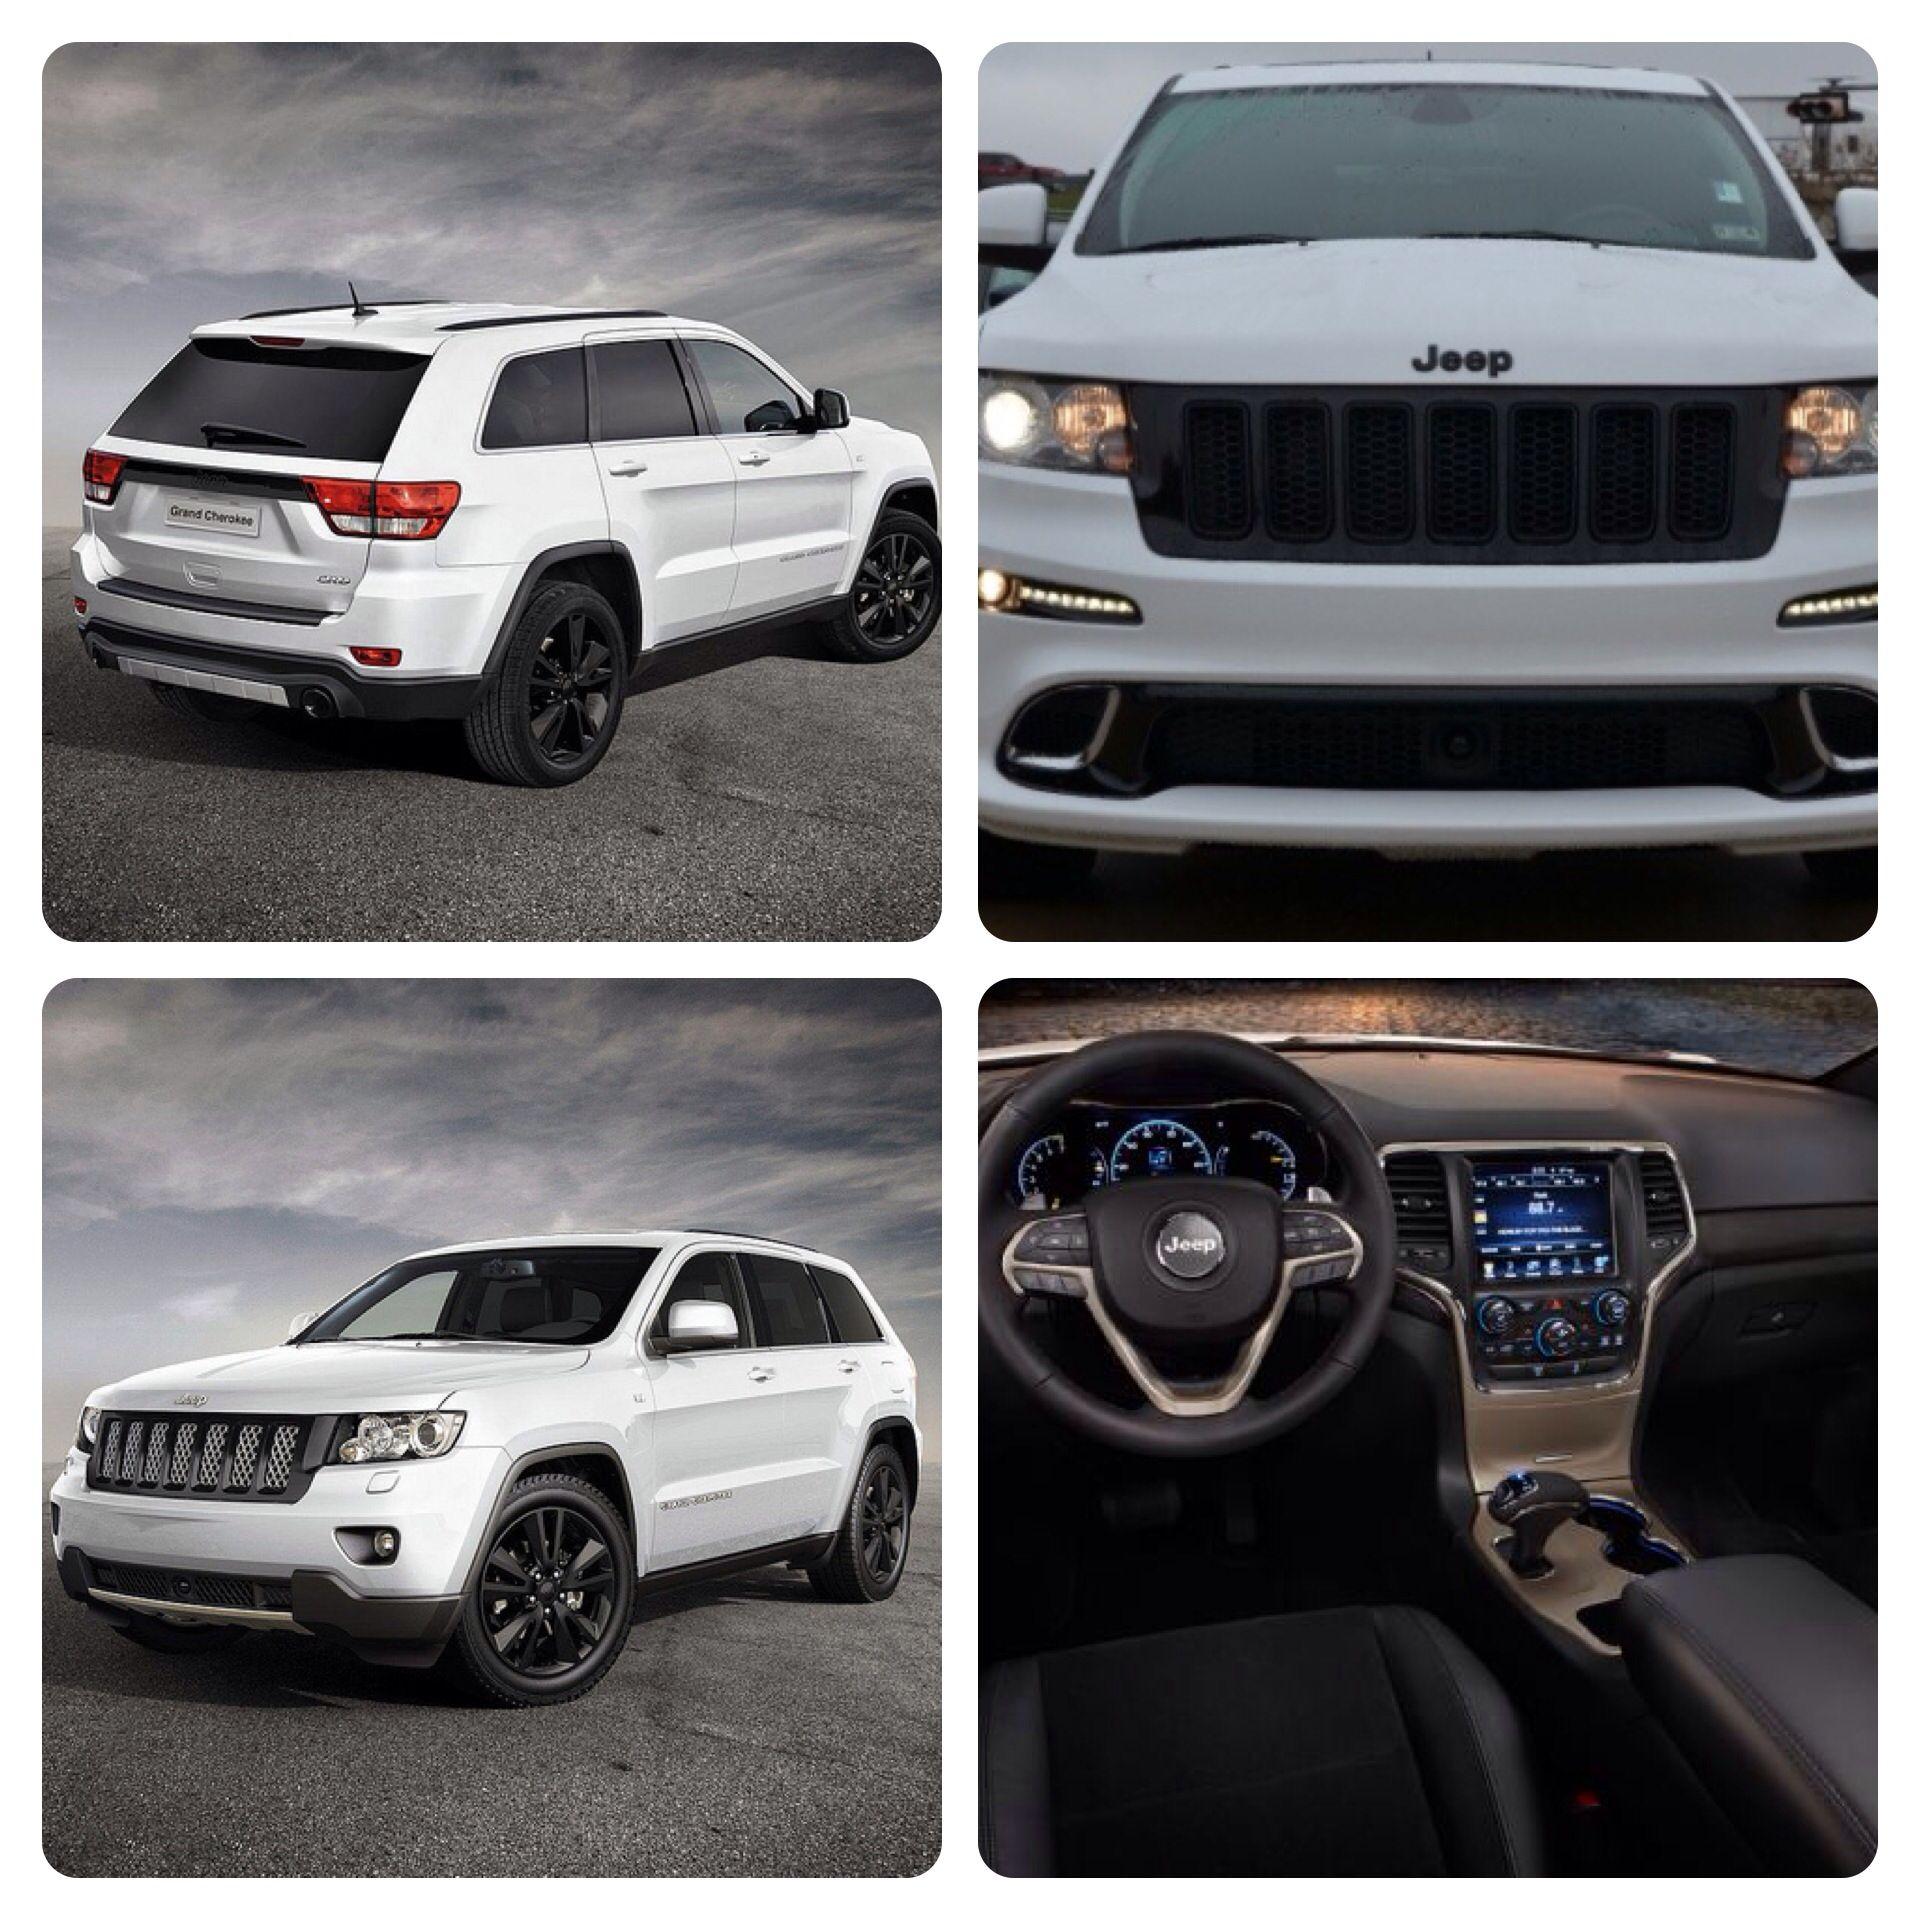 2014 Jeep Grand Cherokee Laredo Altitude Package